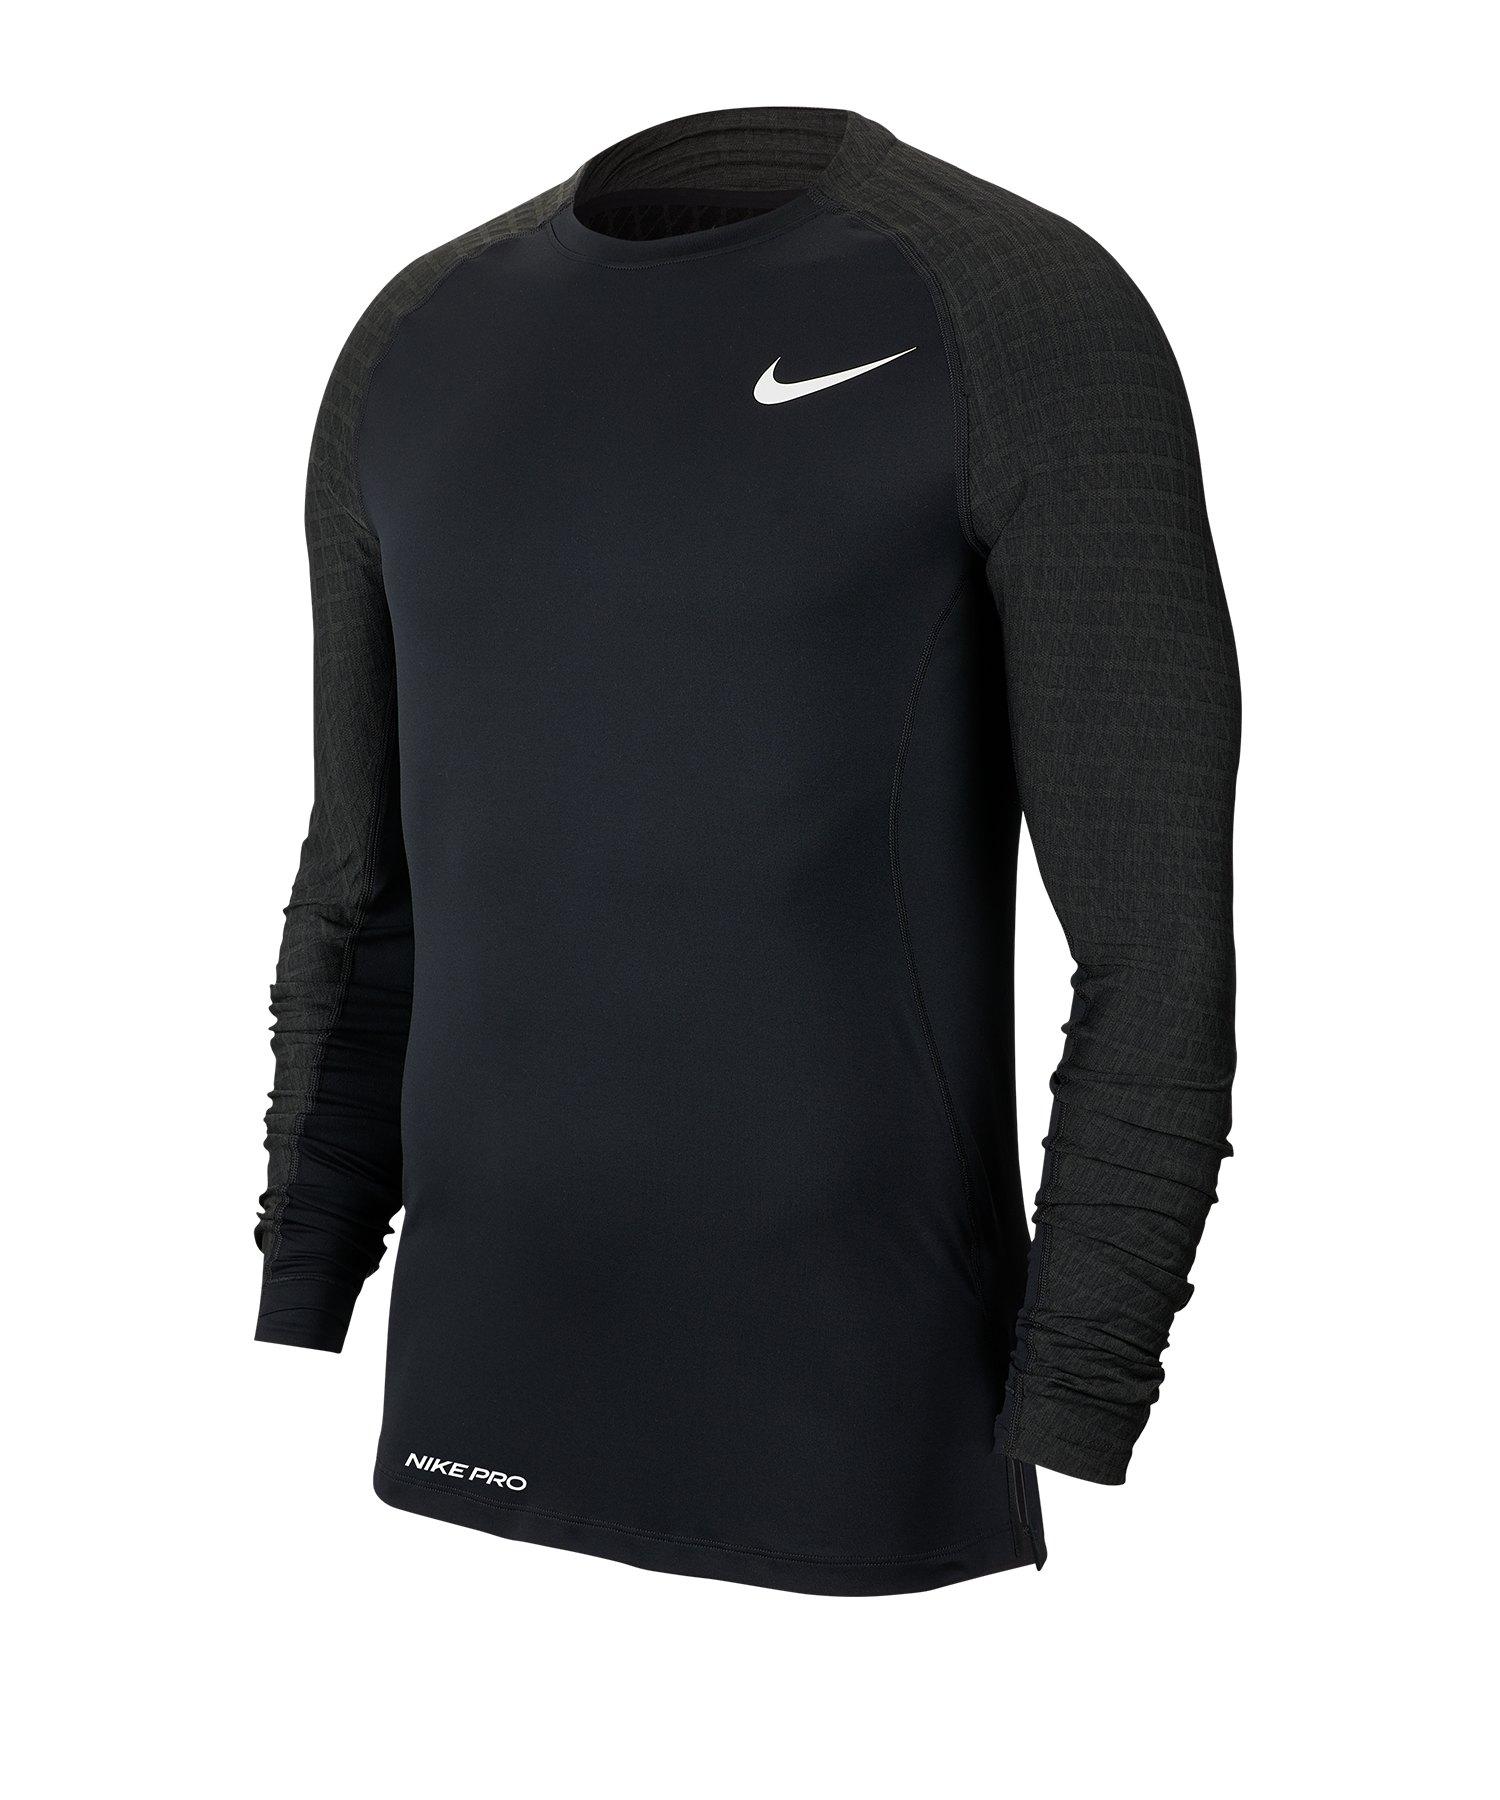 Nike Pro Training Top langarm Schwarz F010 - schwarz